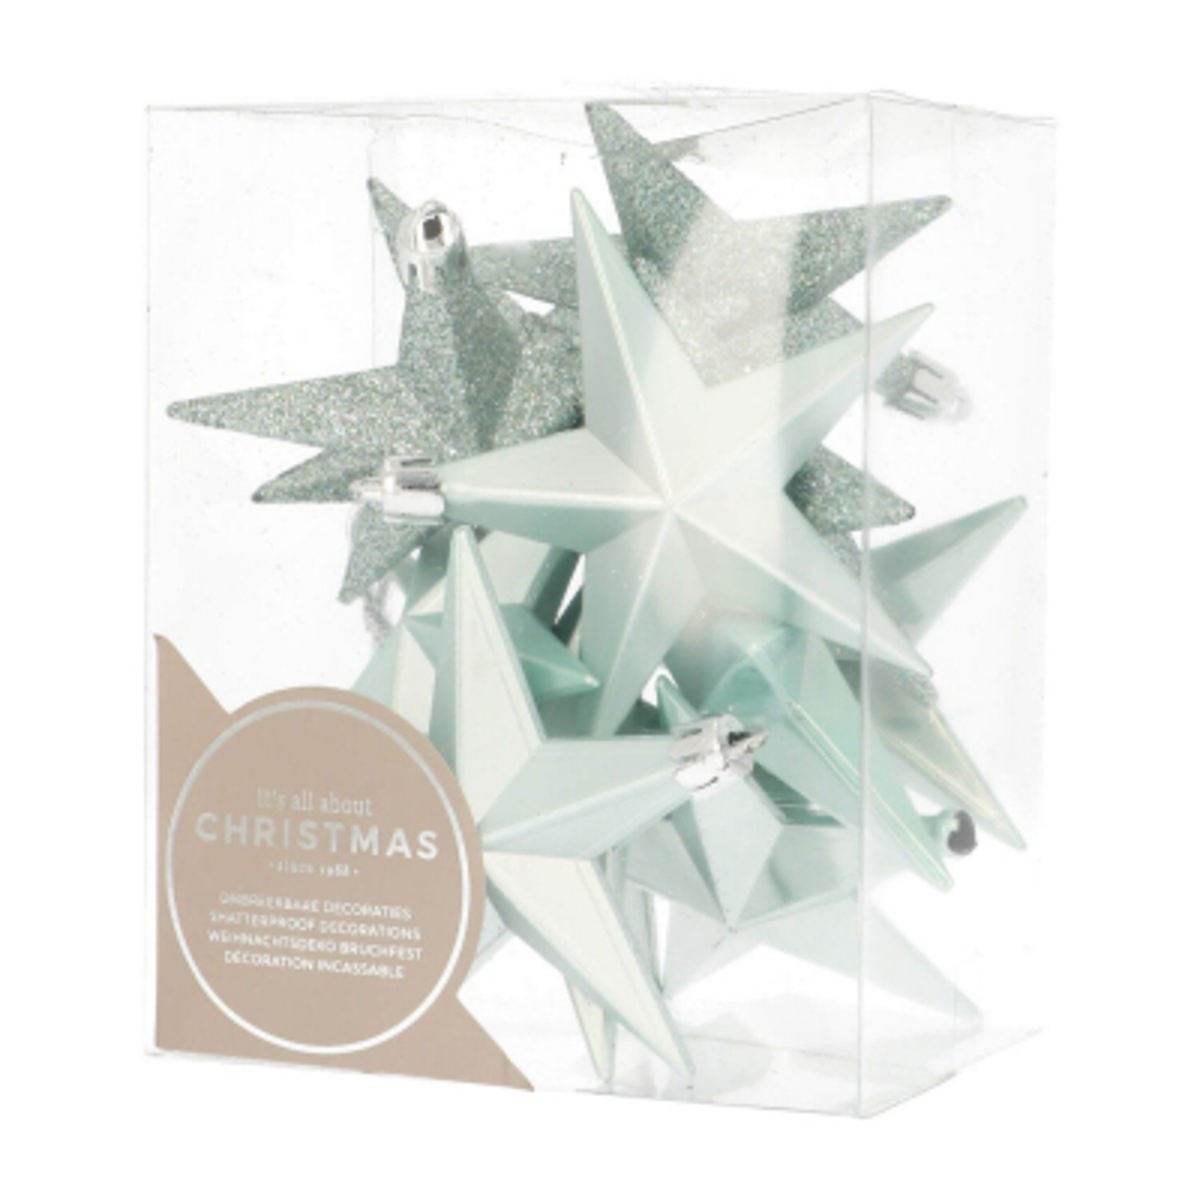 12 Christbaumschmuck Sterne zartblau, Kunststoff, 10 cm